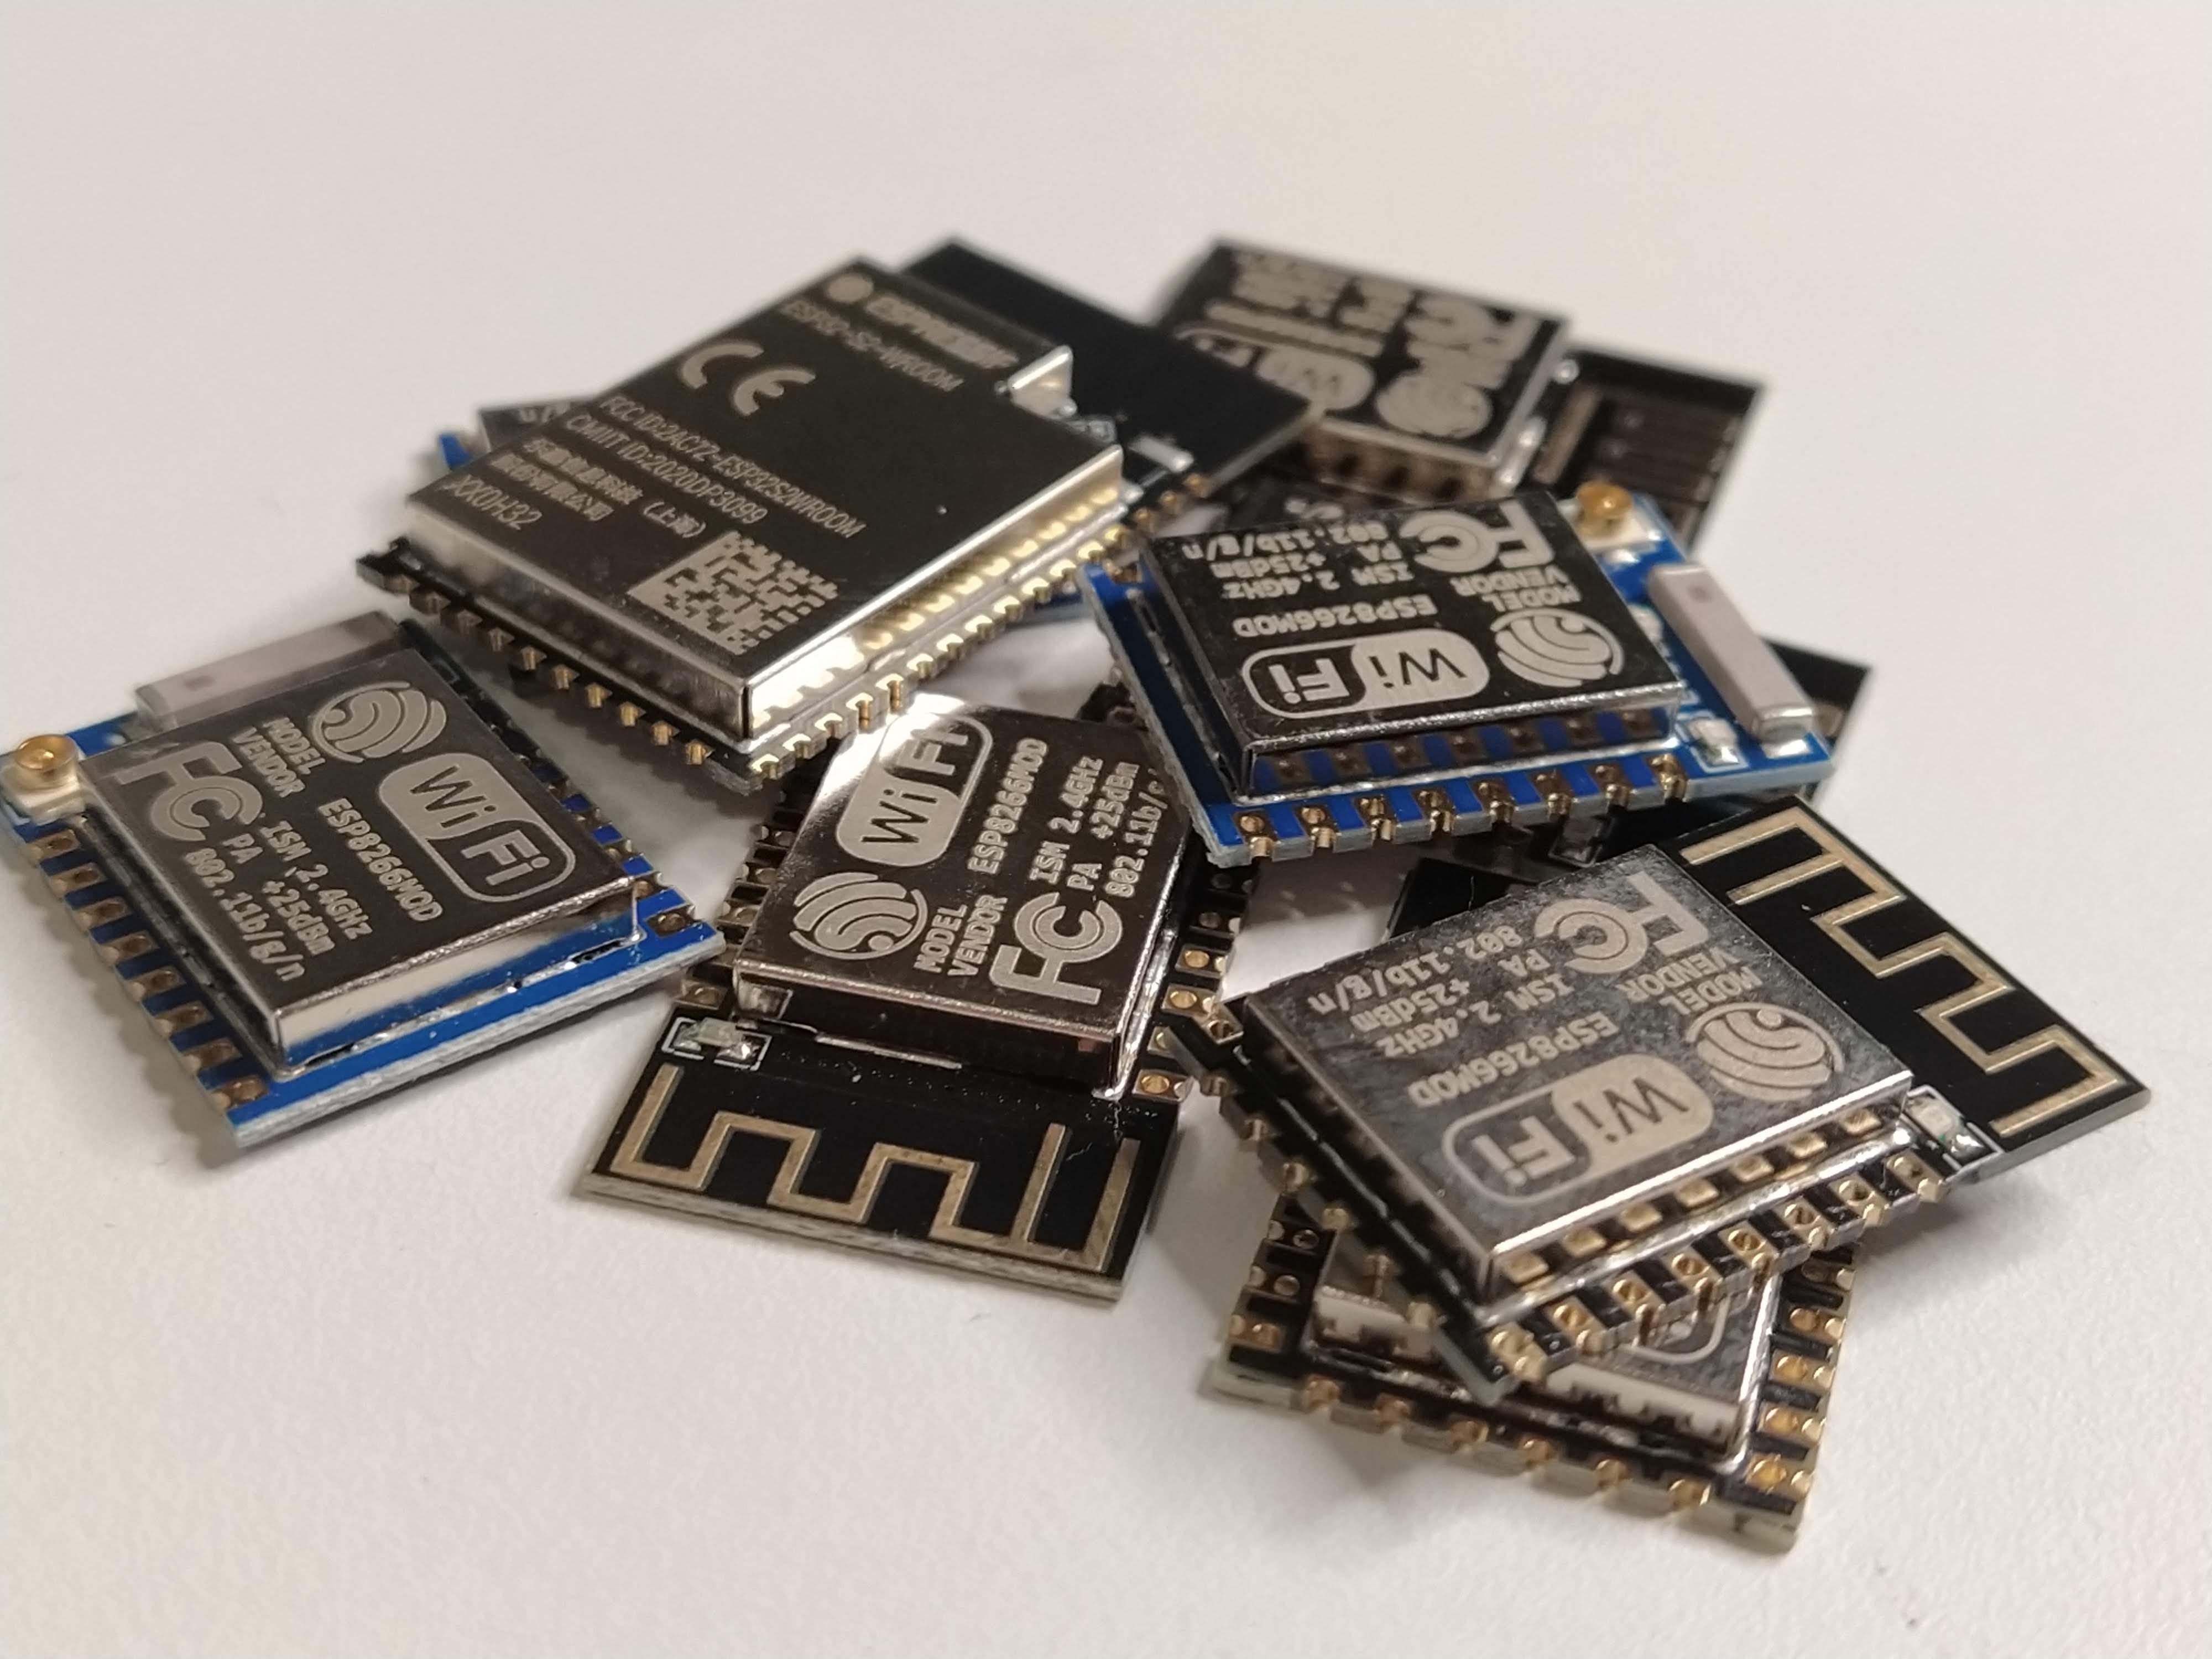 Un gruppo di schede Espressif ESP8266 e ESP32-S2